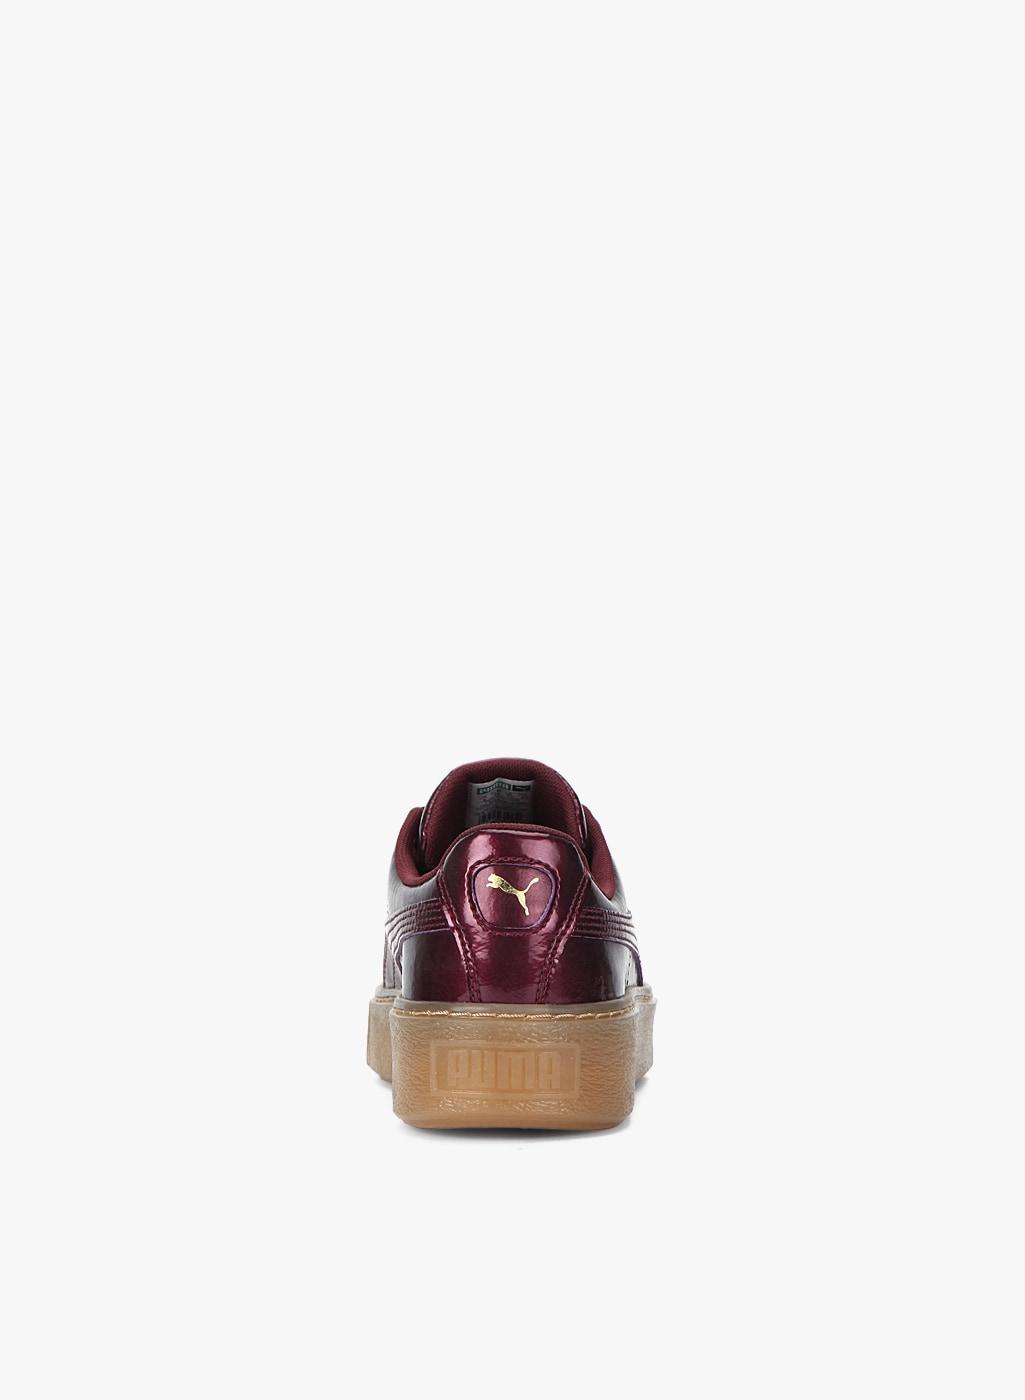 ba90f16620 Purple Off White Shoes Puma - Buy Purple Off White Shoes Puma online ...